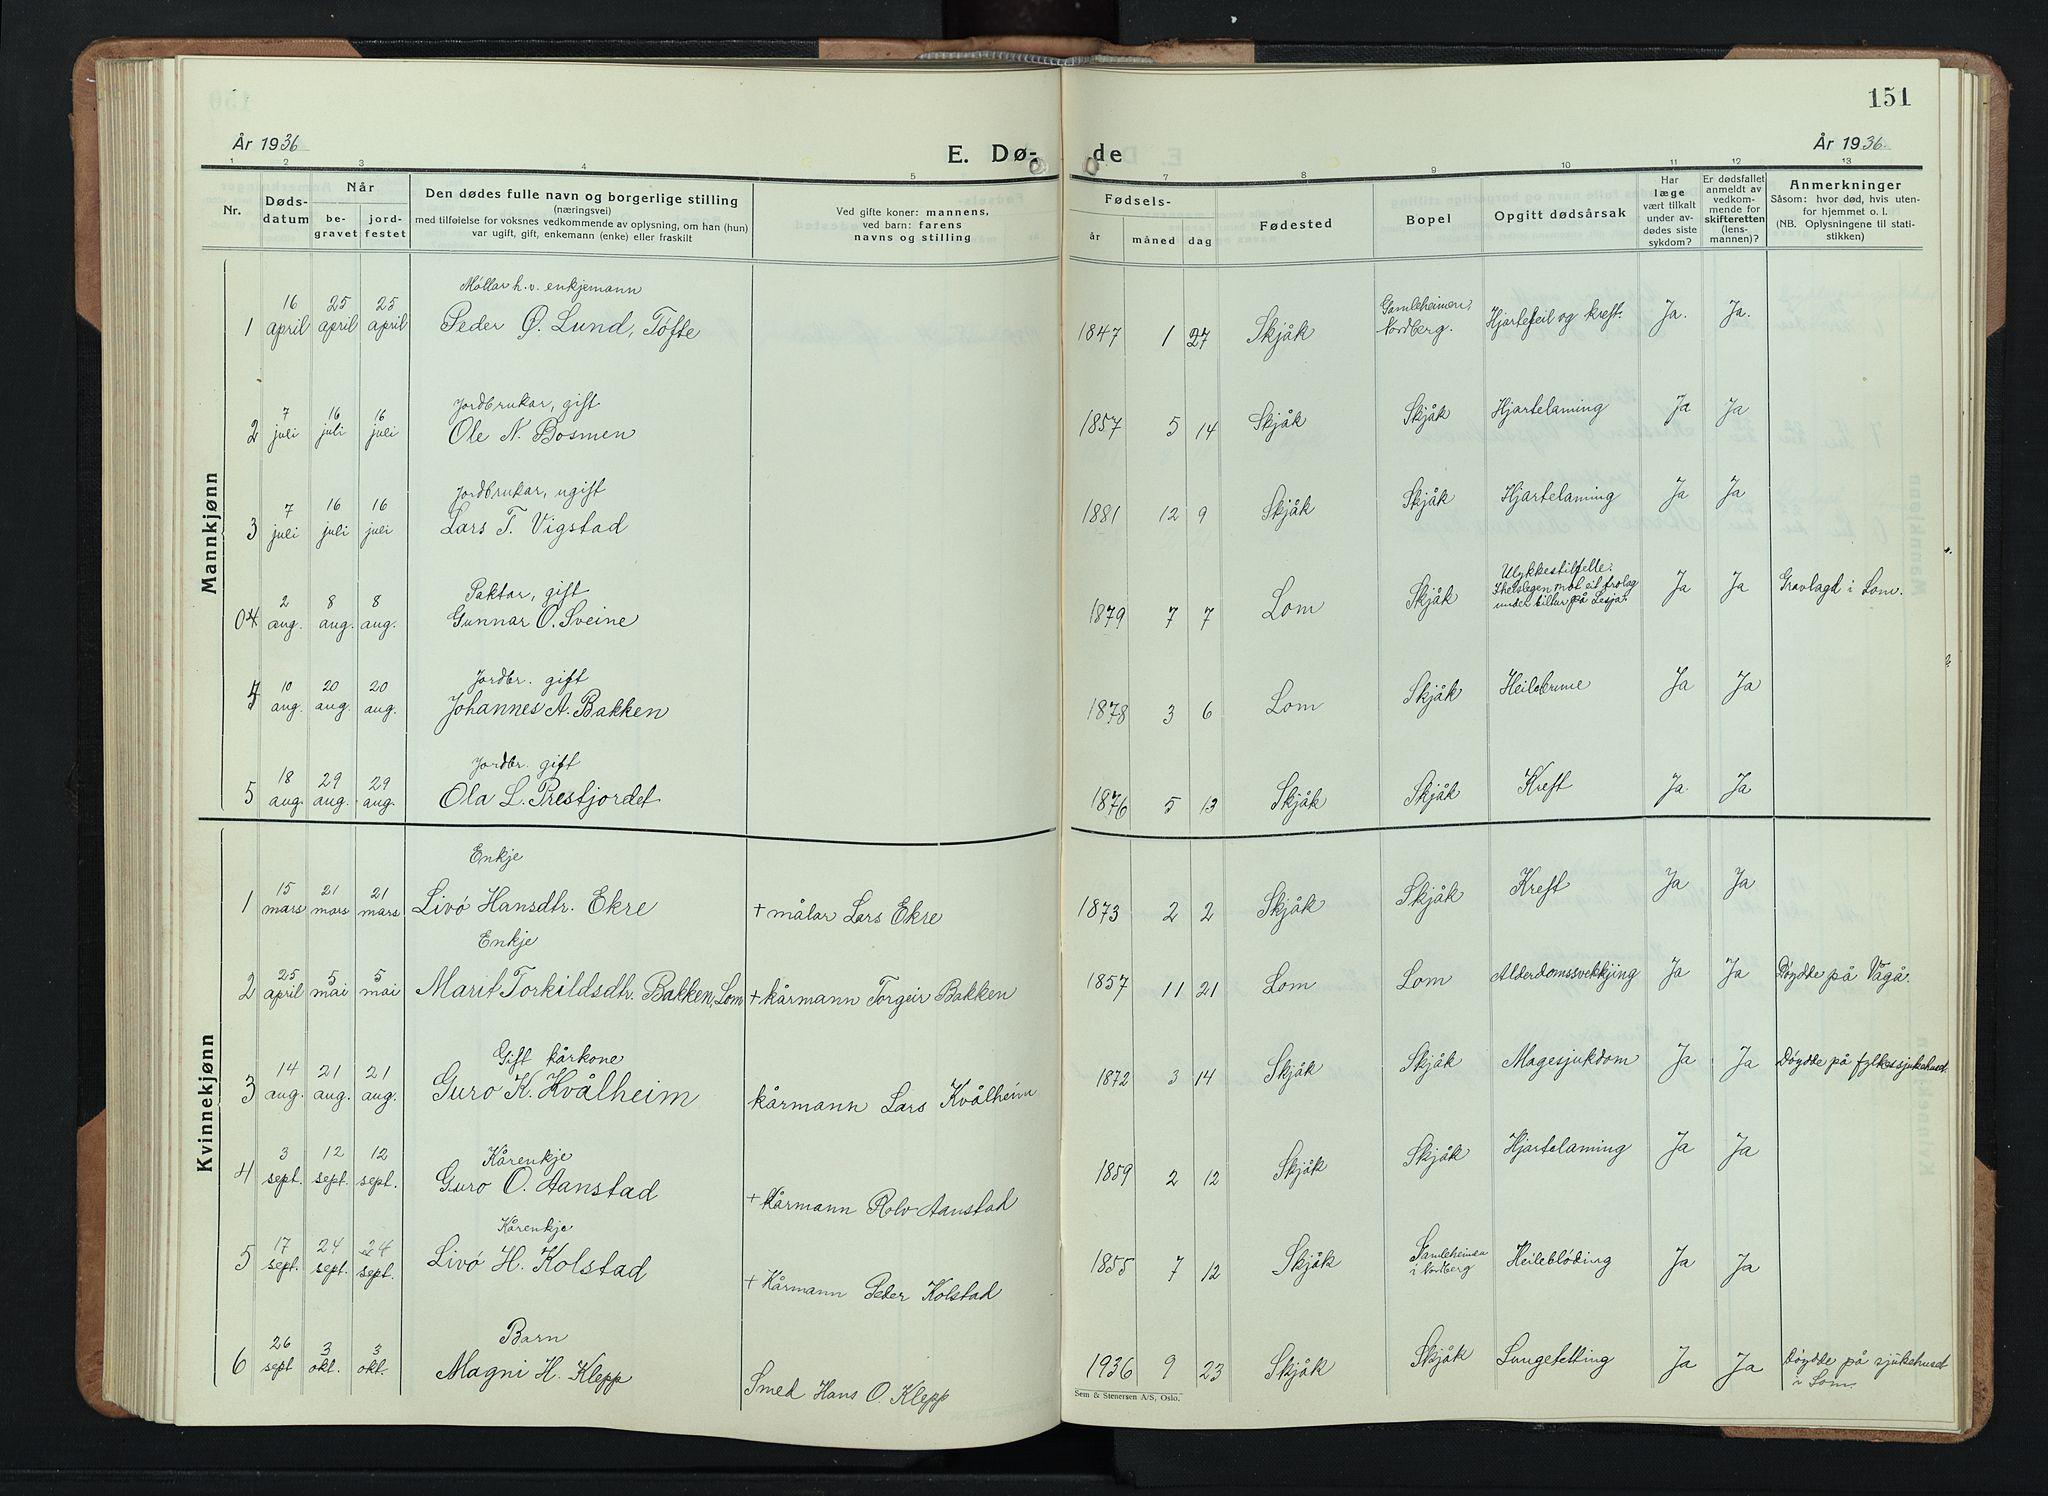 SAH, Skjåk prestekontor, Klokkerbok nr. 6, 1933-1954, s. 151